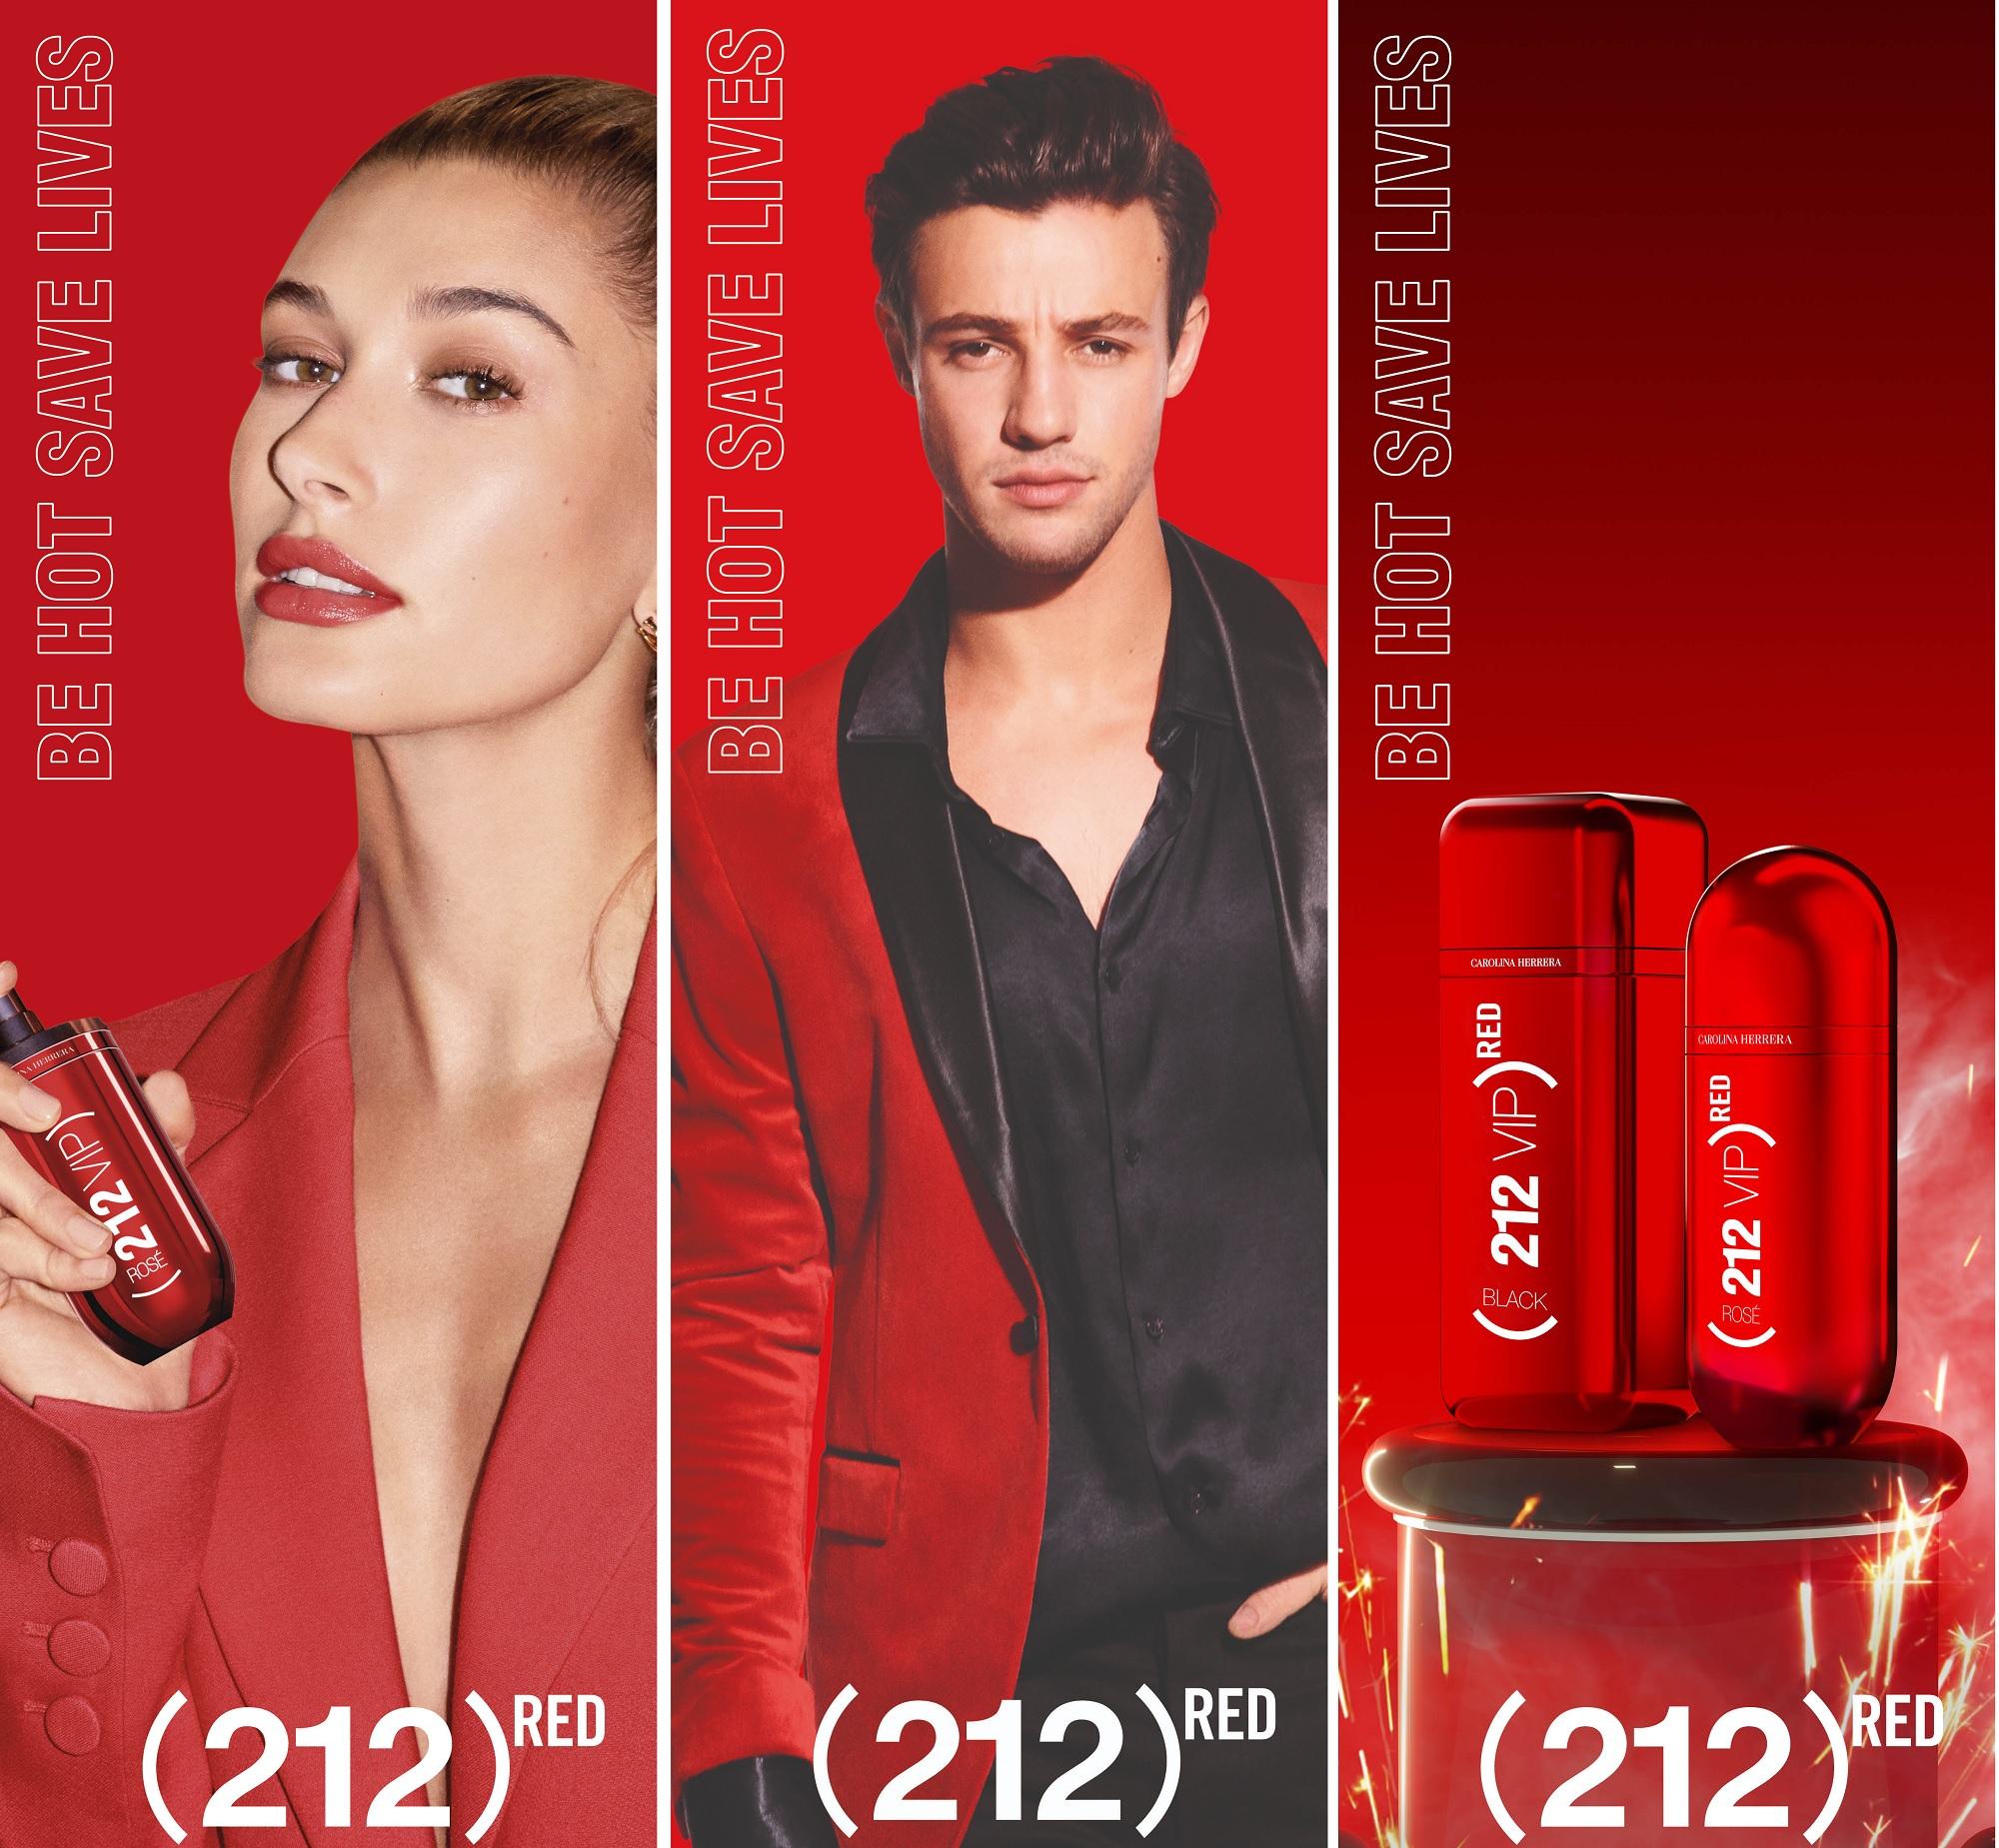 212 vip black red edition